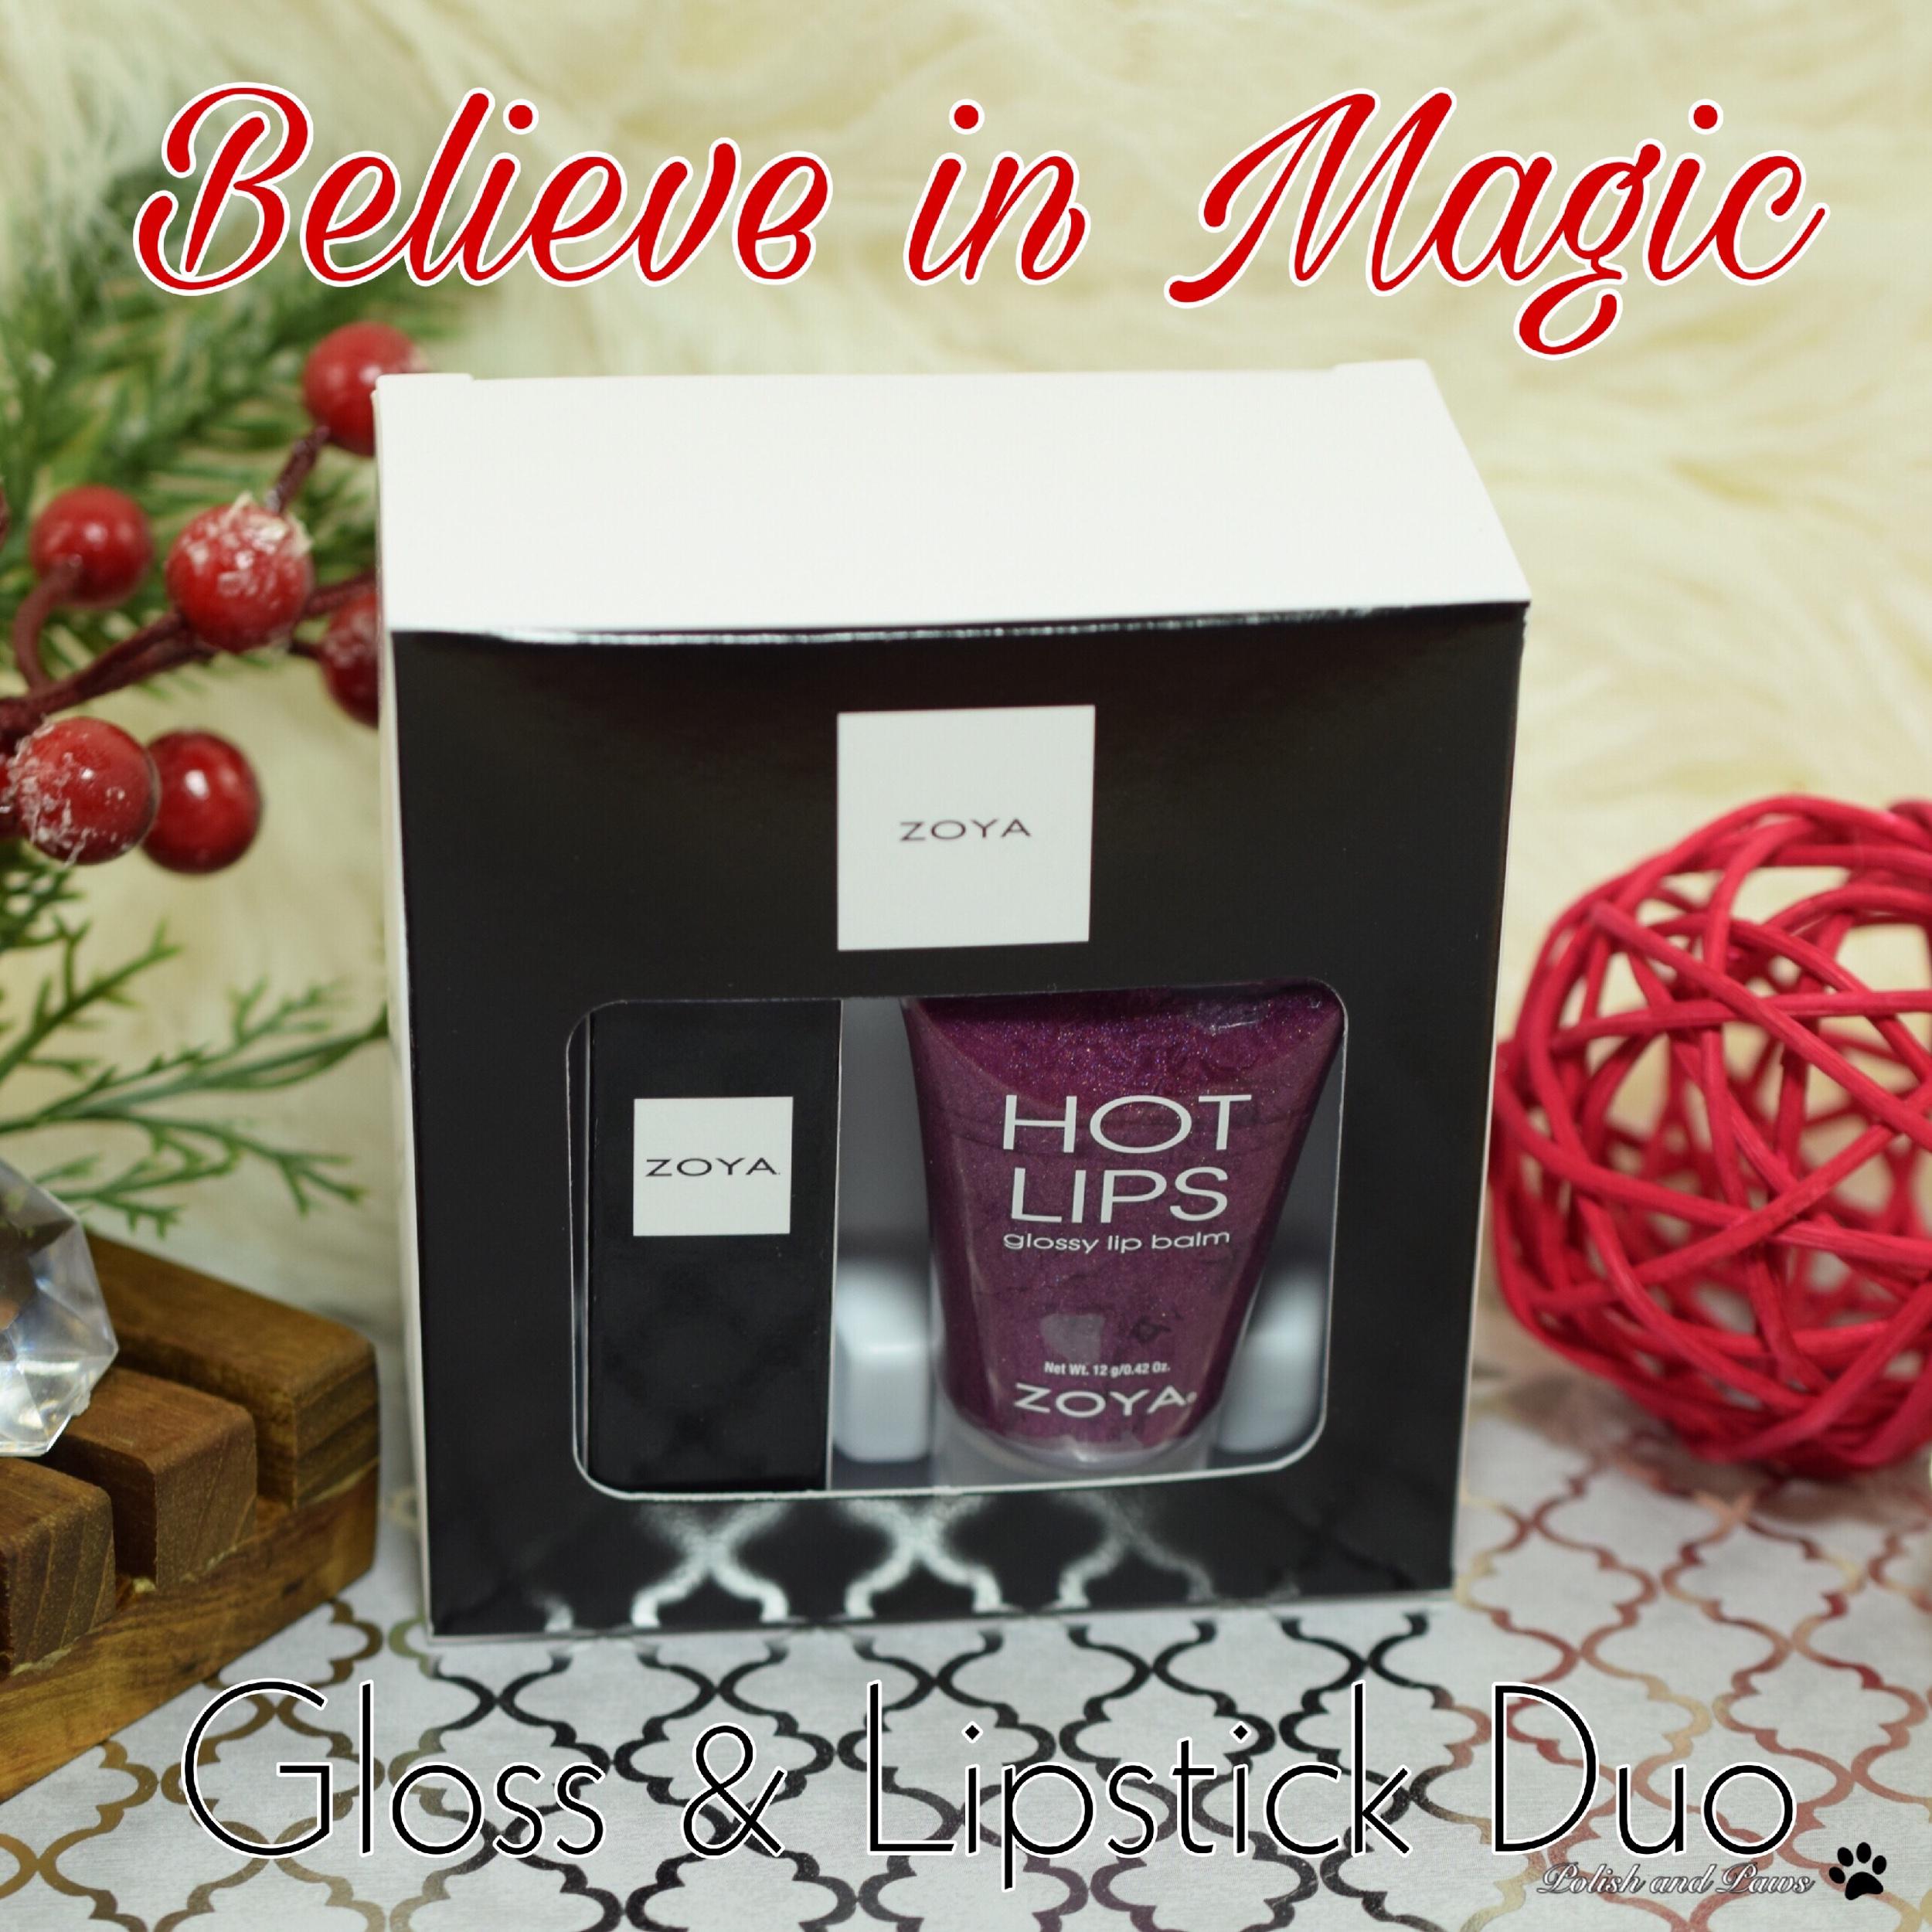 Zoya Believe in Magic Gloss & Lipstick Duo